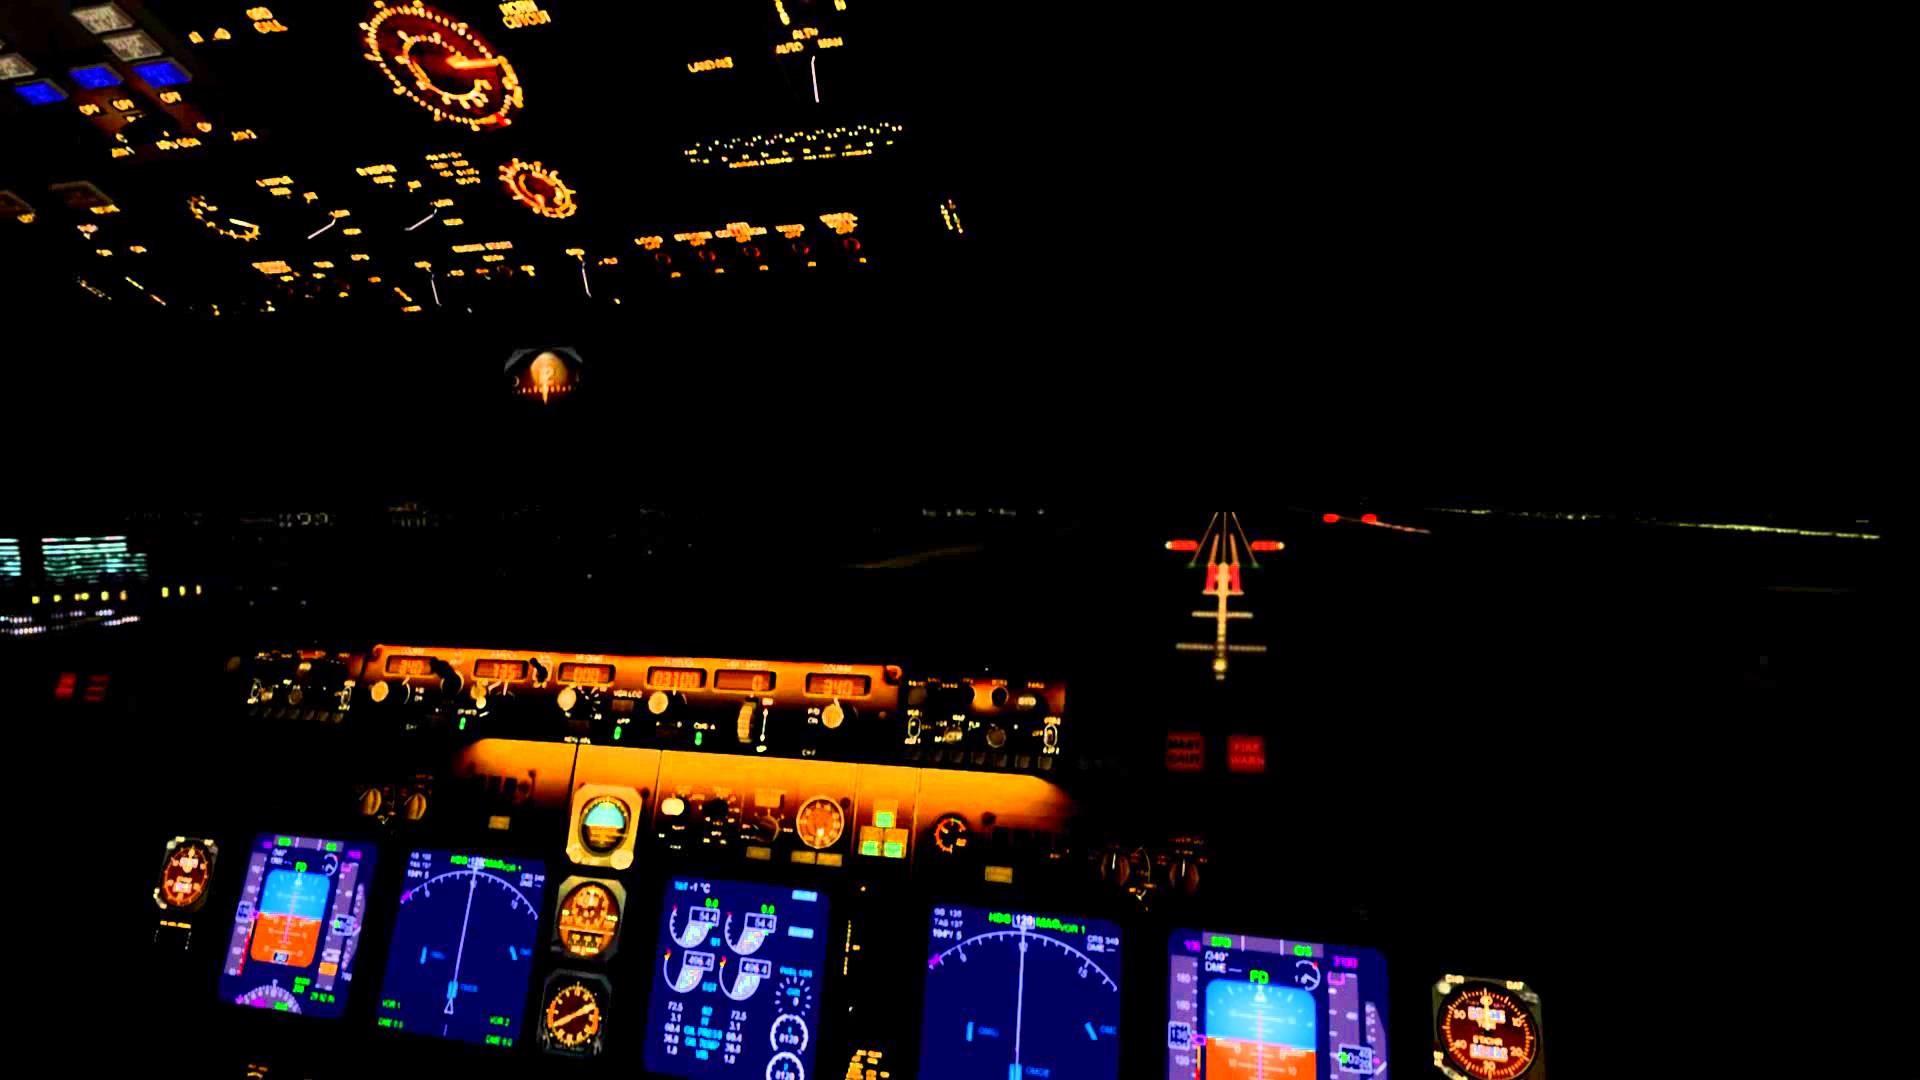 OFF MARKET:NEW BOEING 777-300 FOR SALE / NEW BOEING 777-300ER FOR SALE.  BEST PRICE. #Boeing #Boeing777 #B777 #Boeing777300 #Boeing777300ER #777300…